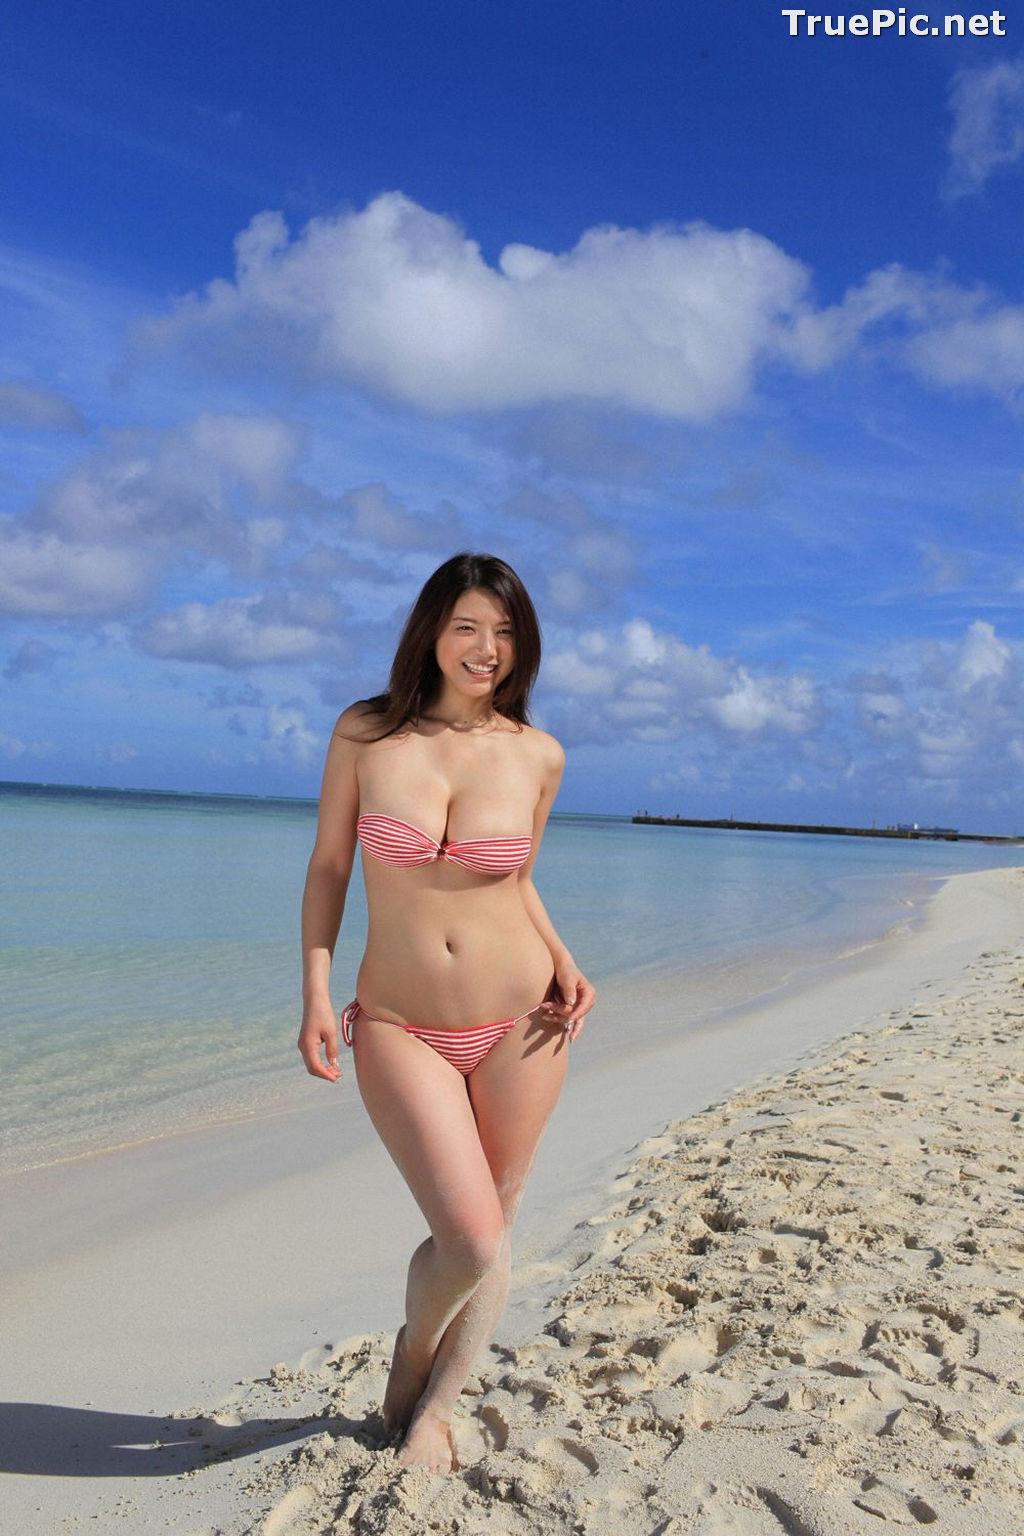 Image [YS Web] Vol.306 - Japanese Actress and Gravure Idol - Hitomi Aizawa - TruePic.net - Picture-2